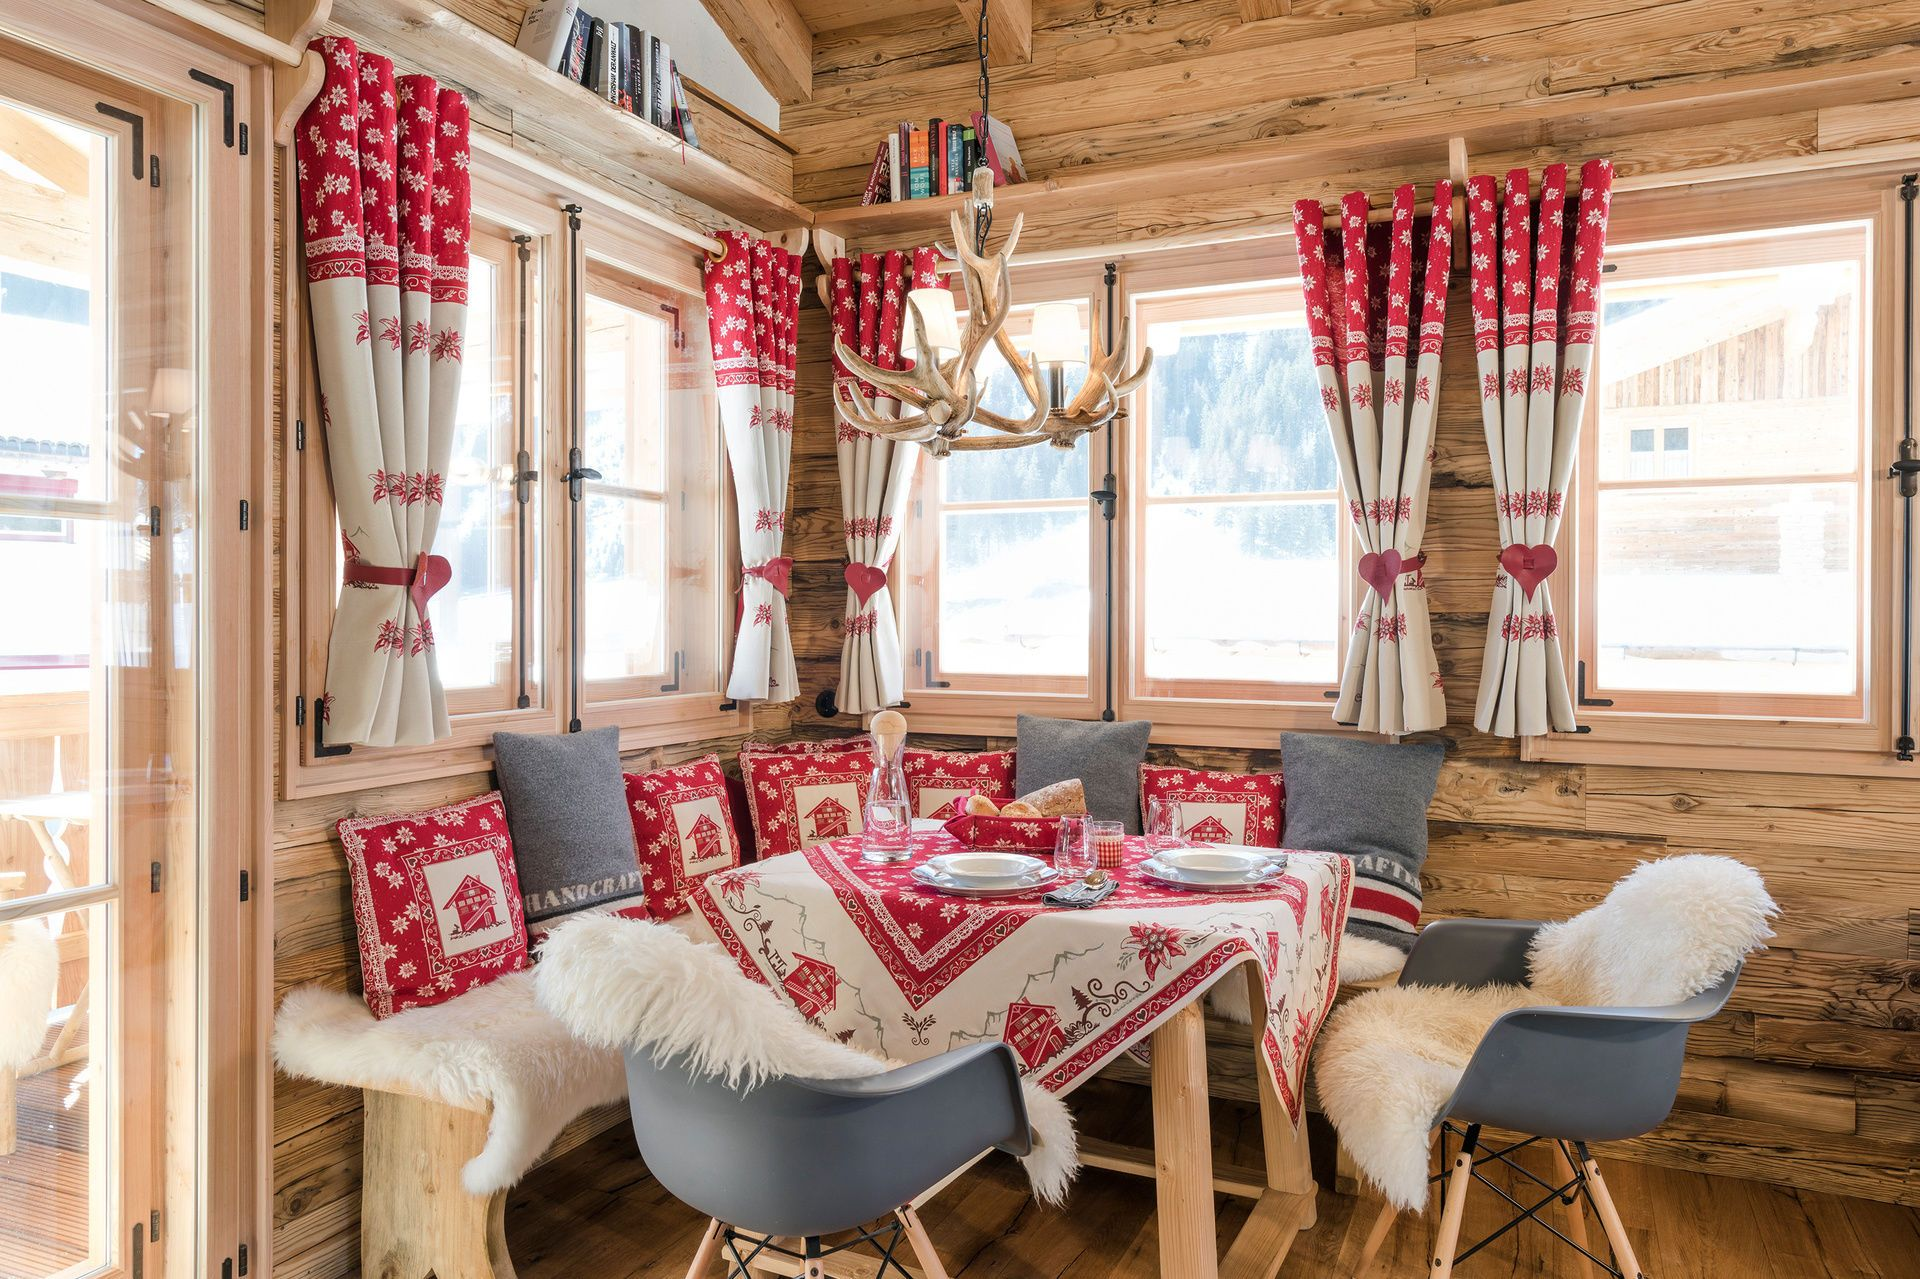 kuschel chalet luxus chalet tirol tannheimer tal ferienhaus allg u ferienh user bayern. Black Bedroom Furniture Sets. Home Design Ideas